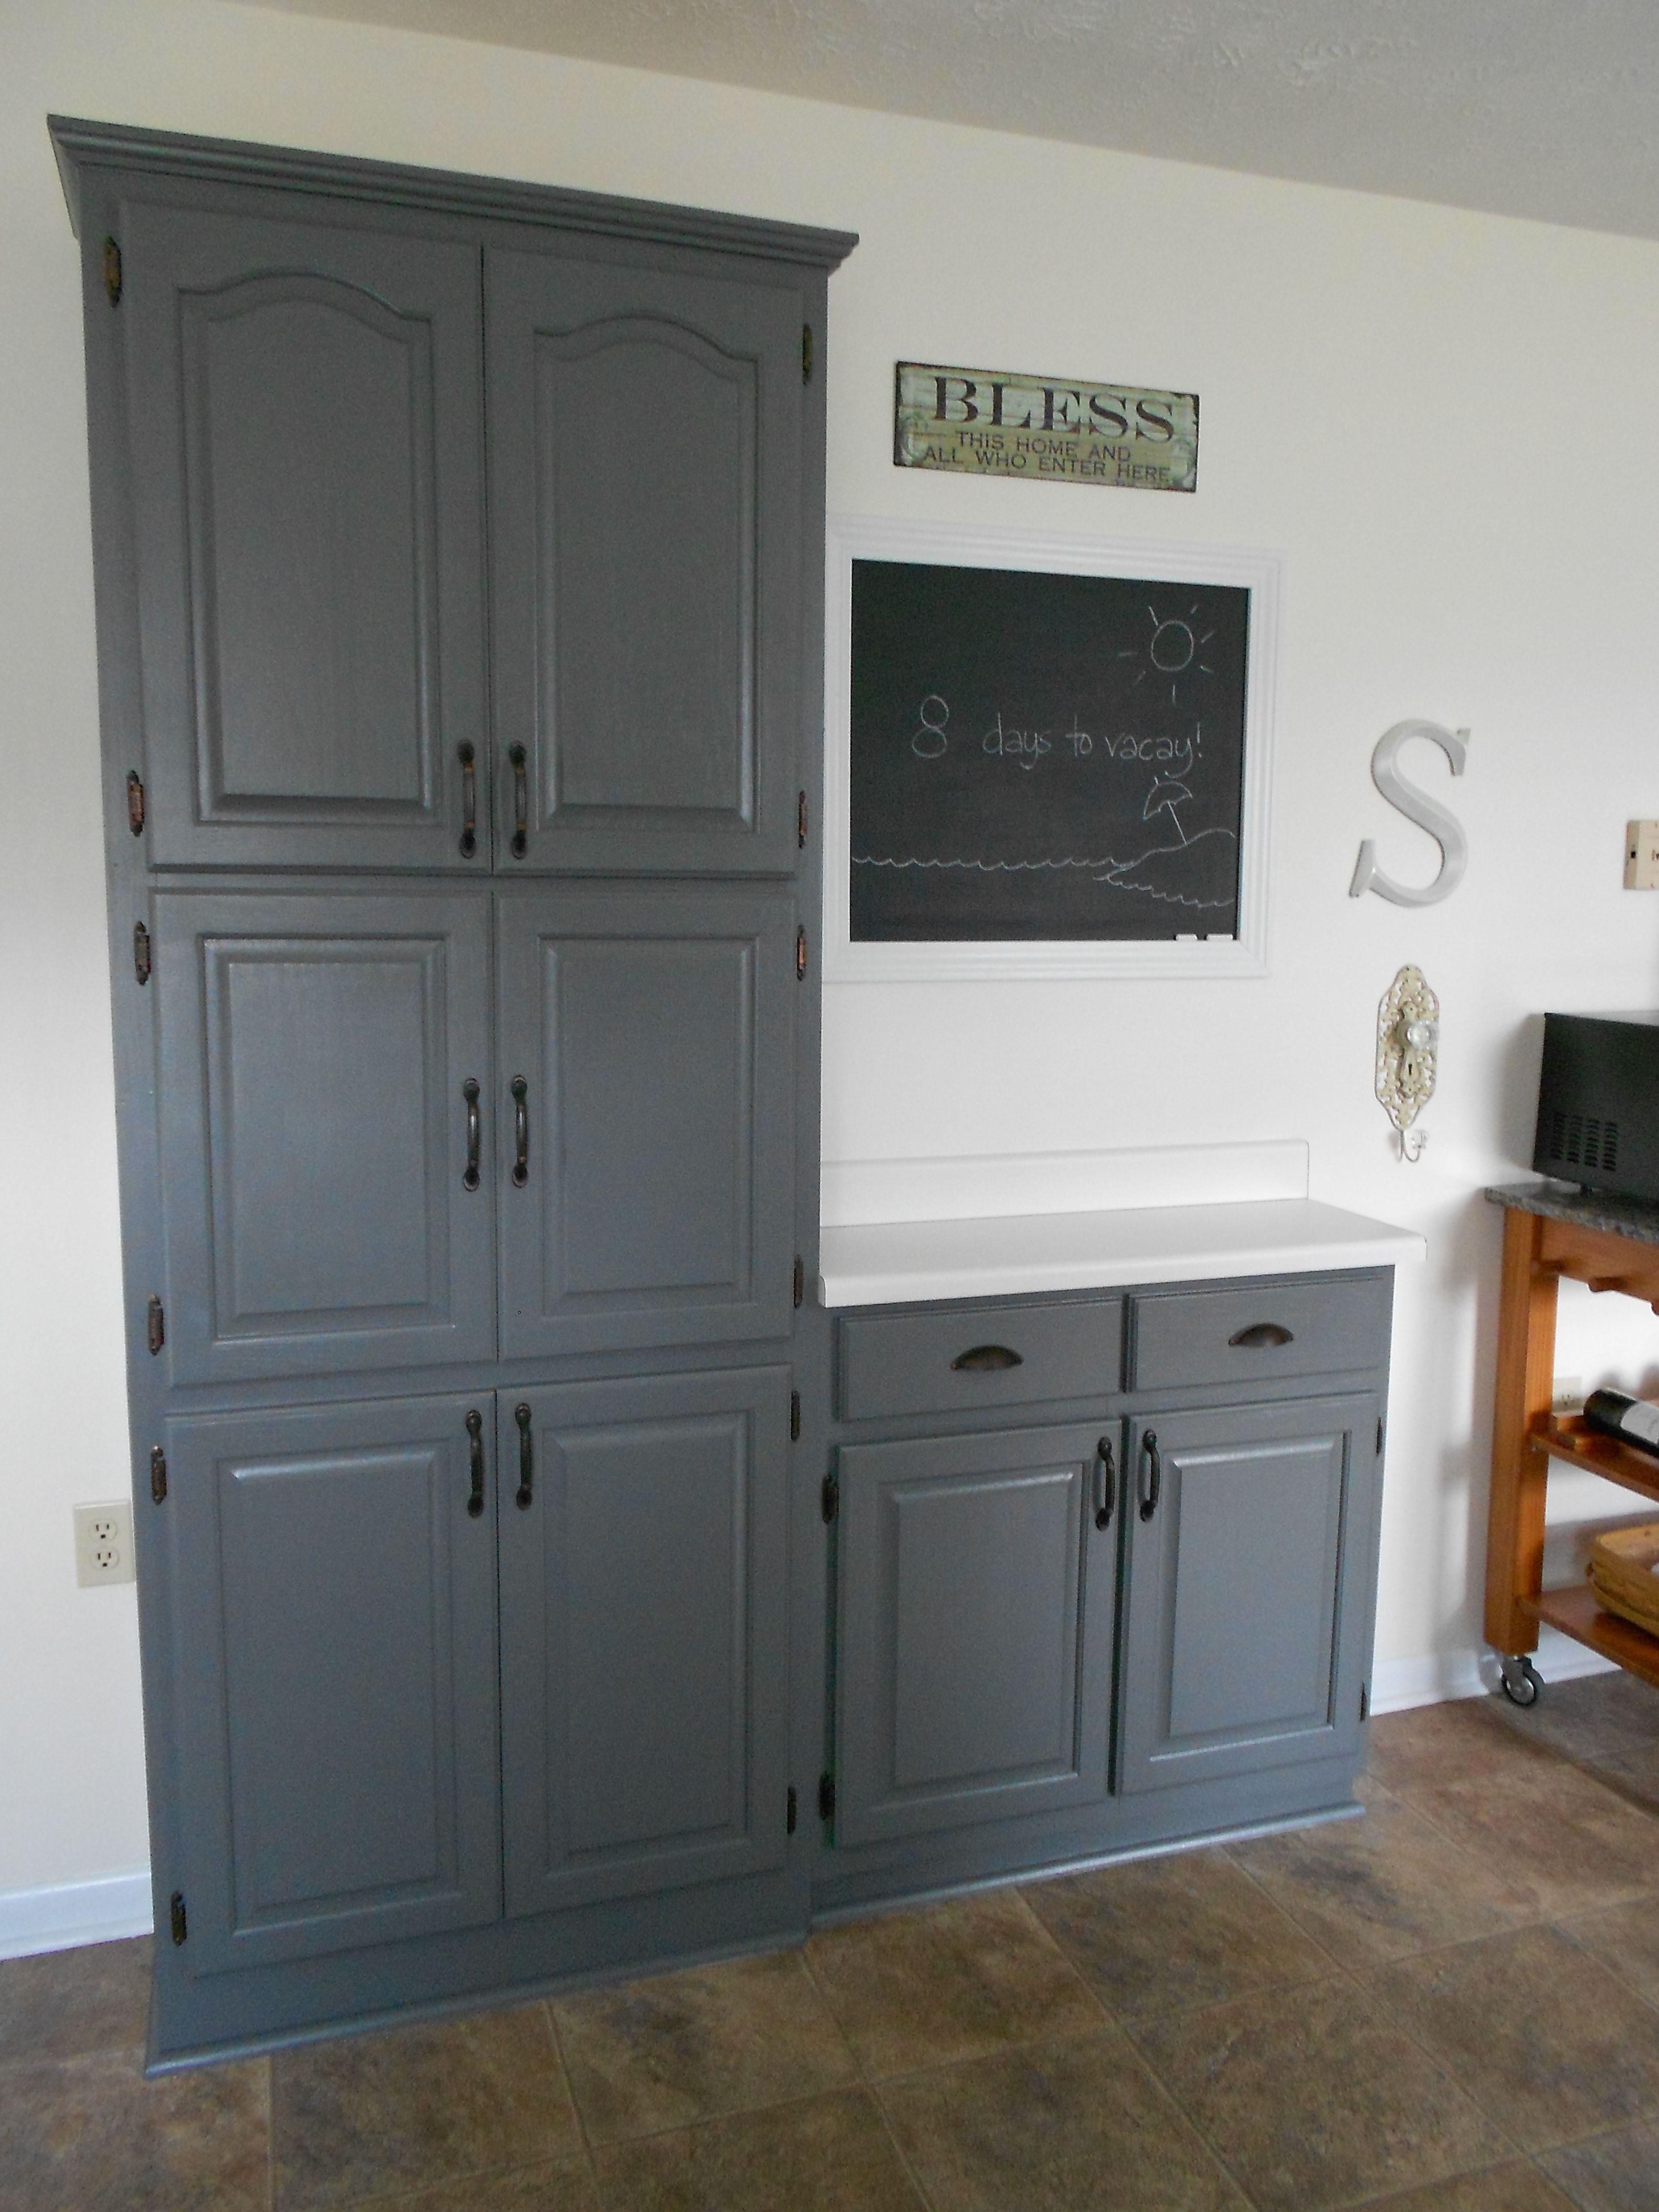 Benjamin moore amherst gray cabinets kitchen pinterest gray cabinets benjamin moore and - Gray kitchen cabinets benjamin moore ...